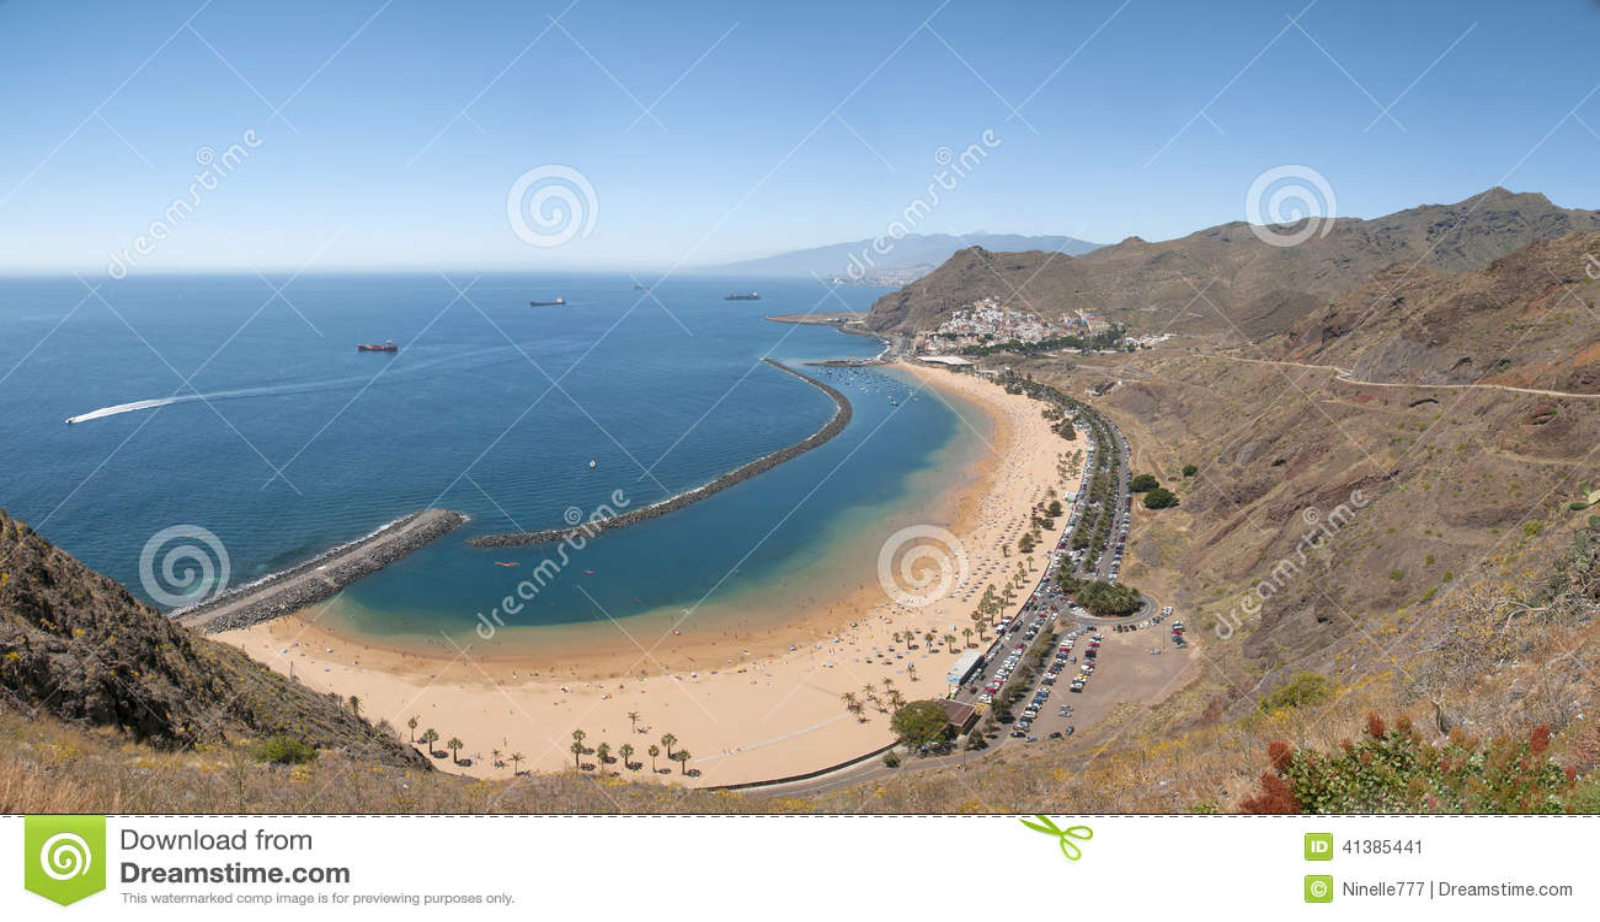 Панорама пляжа Las Teresitas, Тенерифе, Канарских островов, Испании